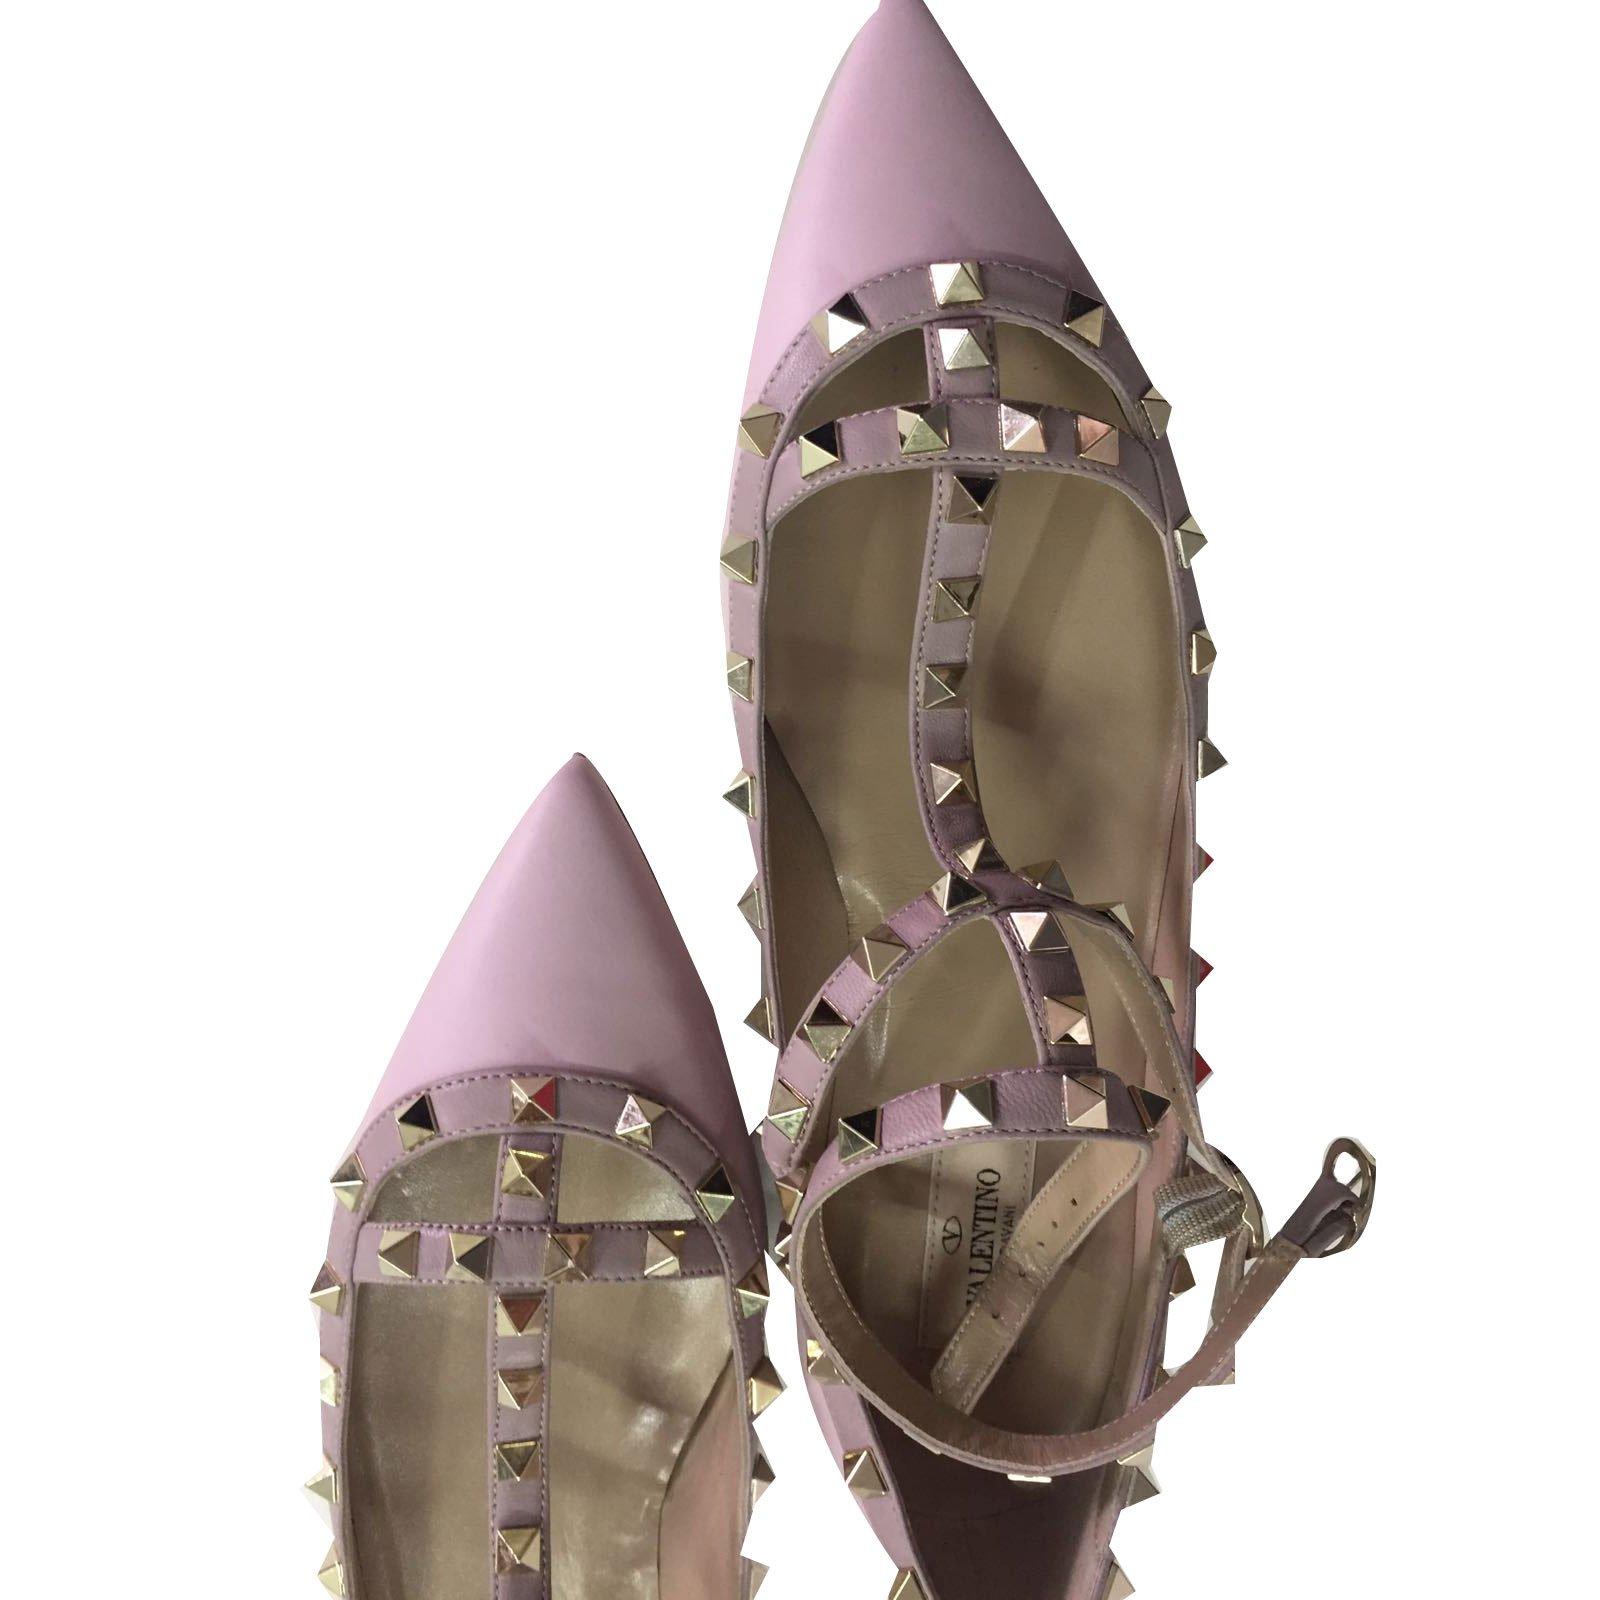 25c4048a51 Valentino Garavani Rockstud Ballet flats Ballet flats Leather Pink ref.49254